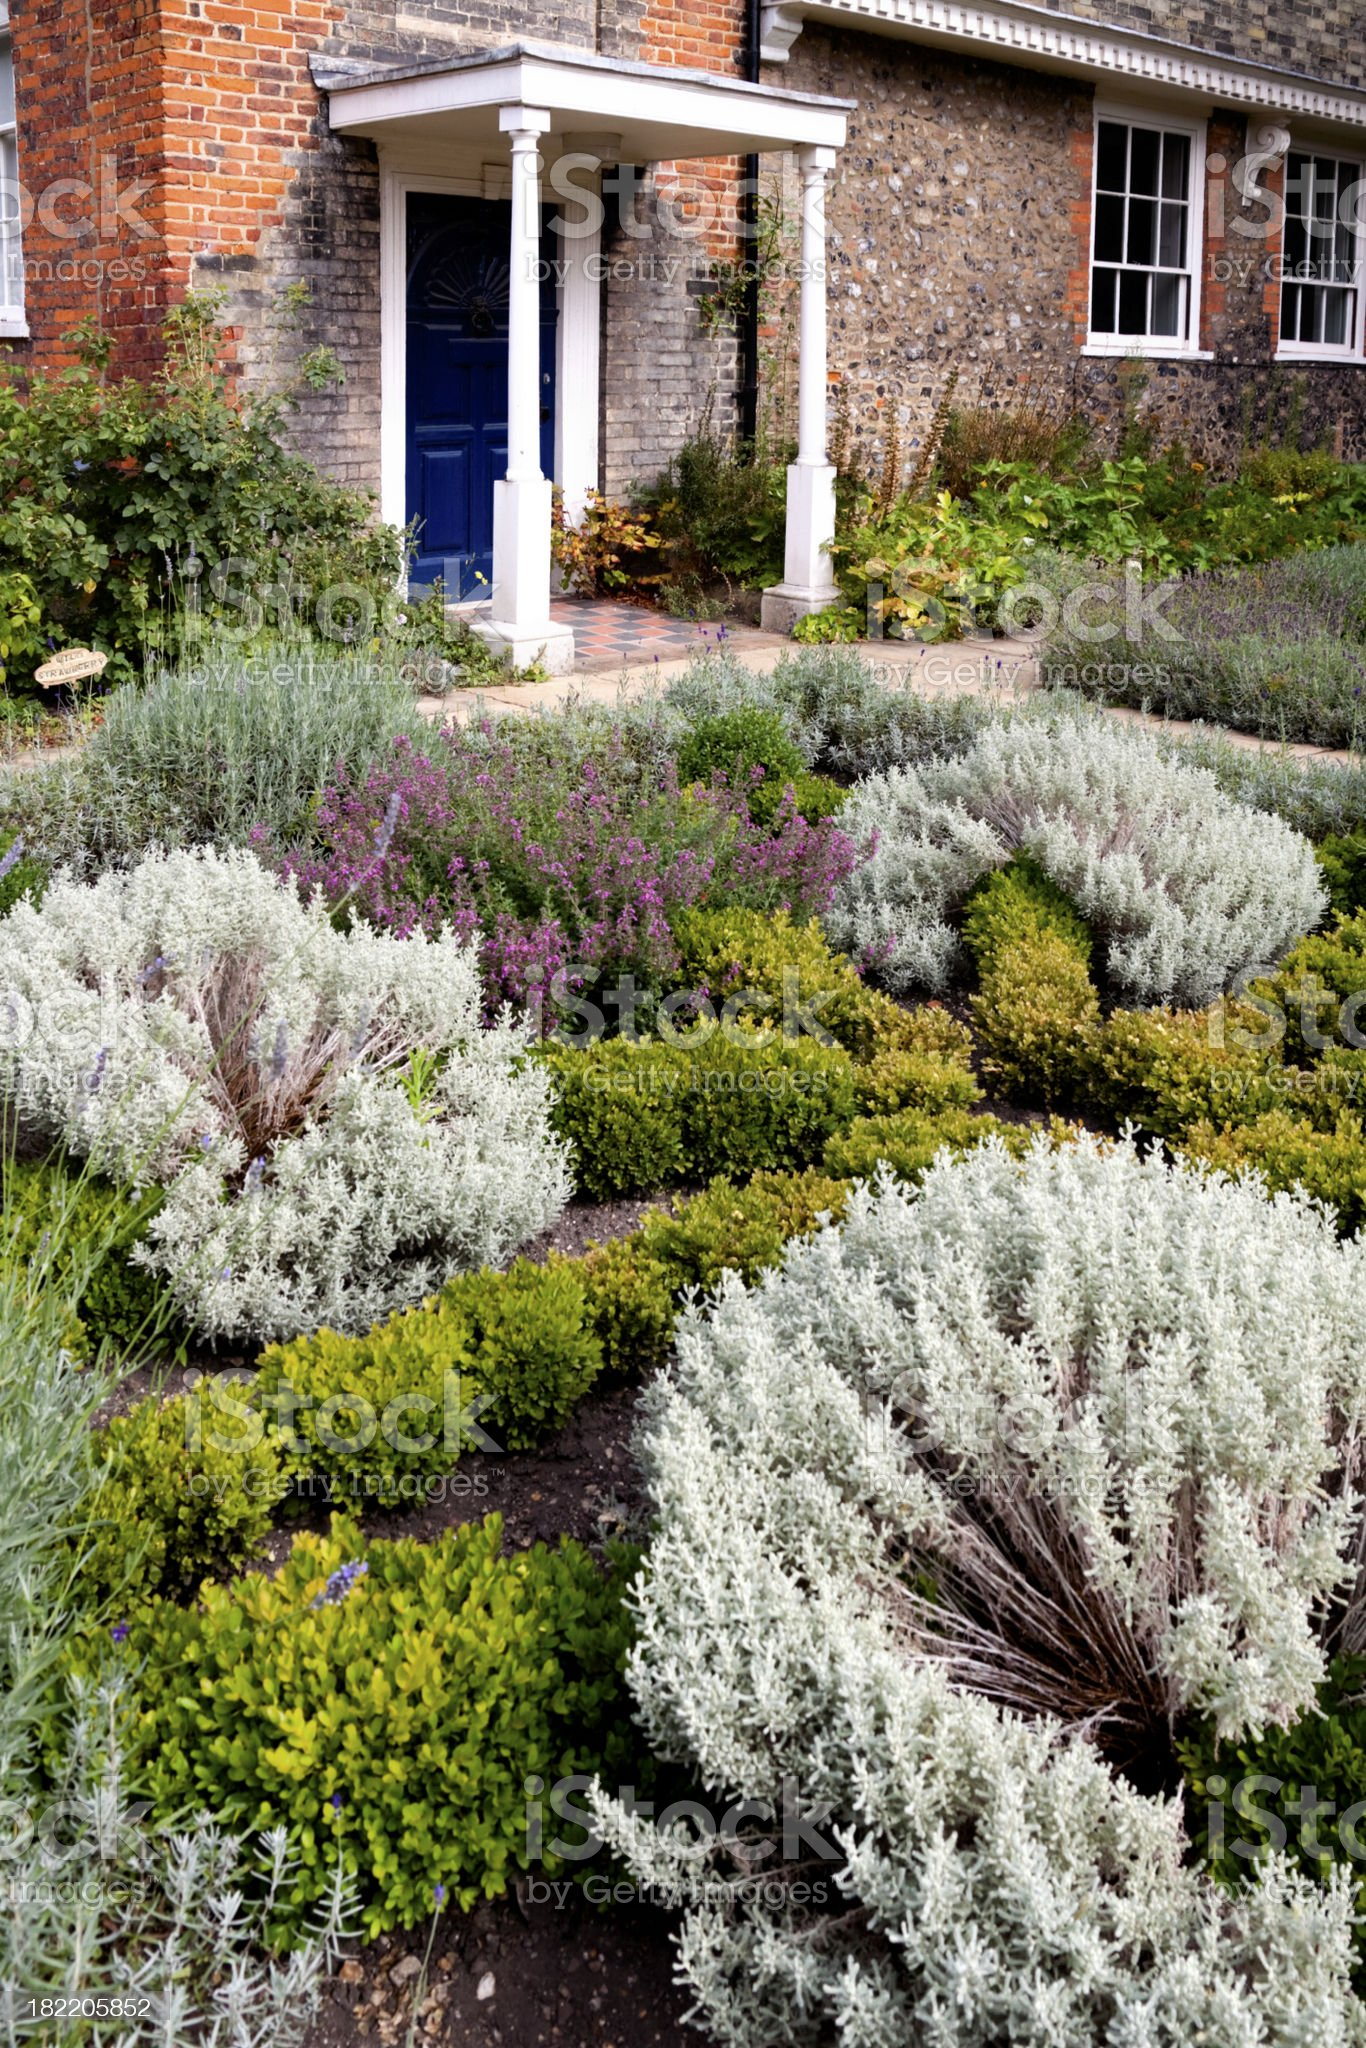 Herb garden and front door royalty-free stock photo